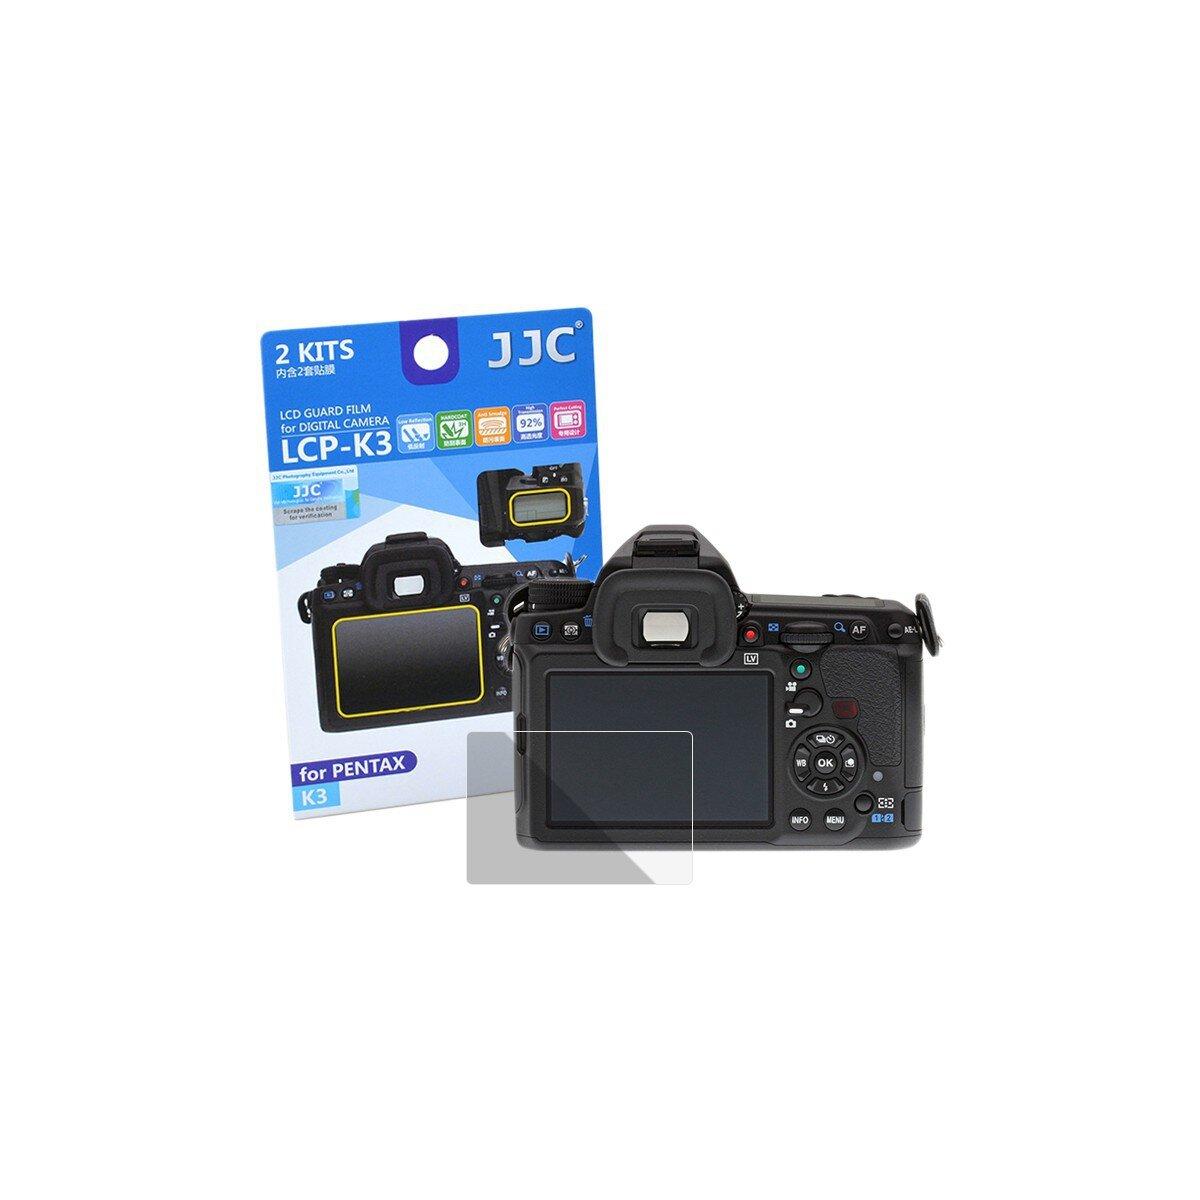 JJC LCP-K3 Displayschutzfolie Screen Protector Kratzschutz kompatibel mit Pentax K3, K3II